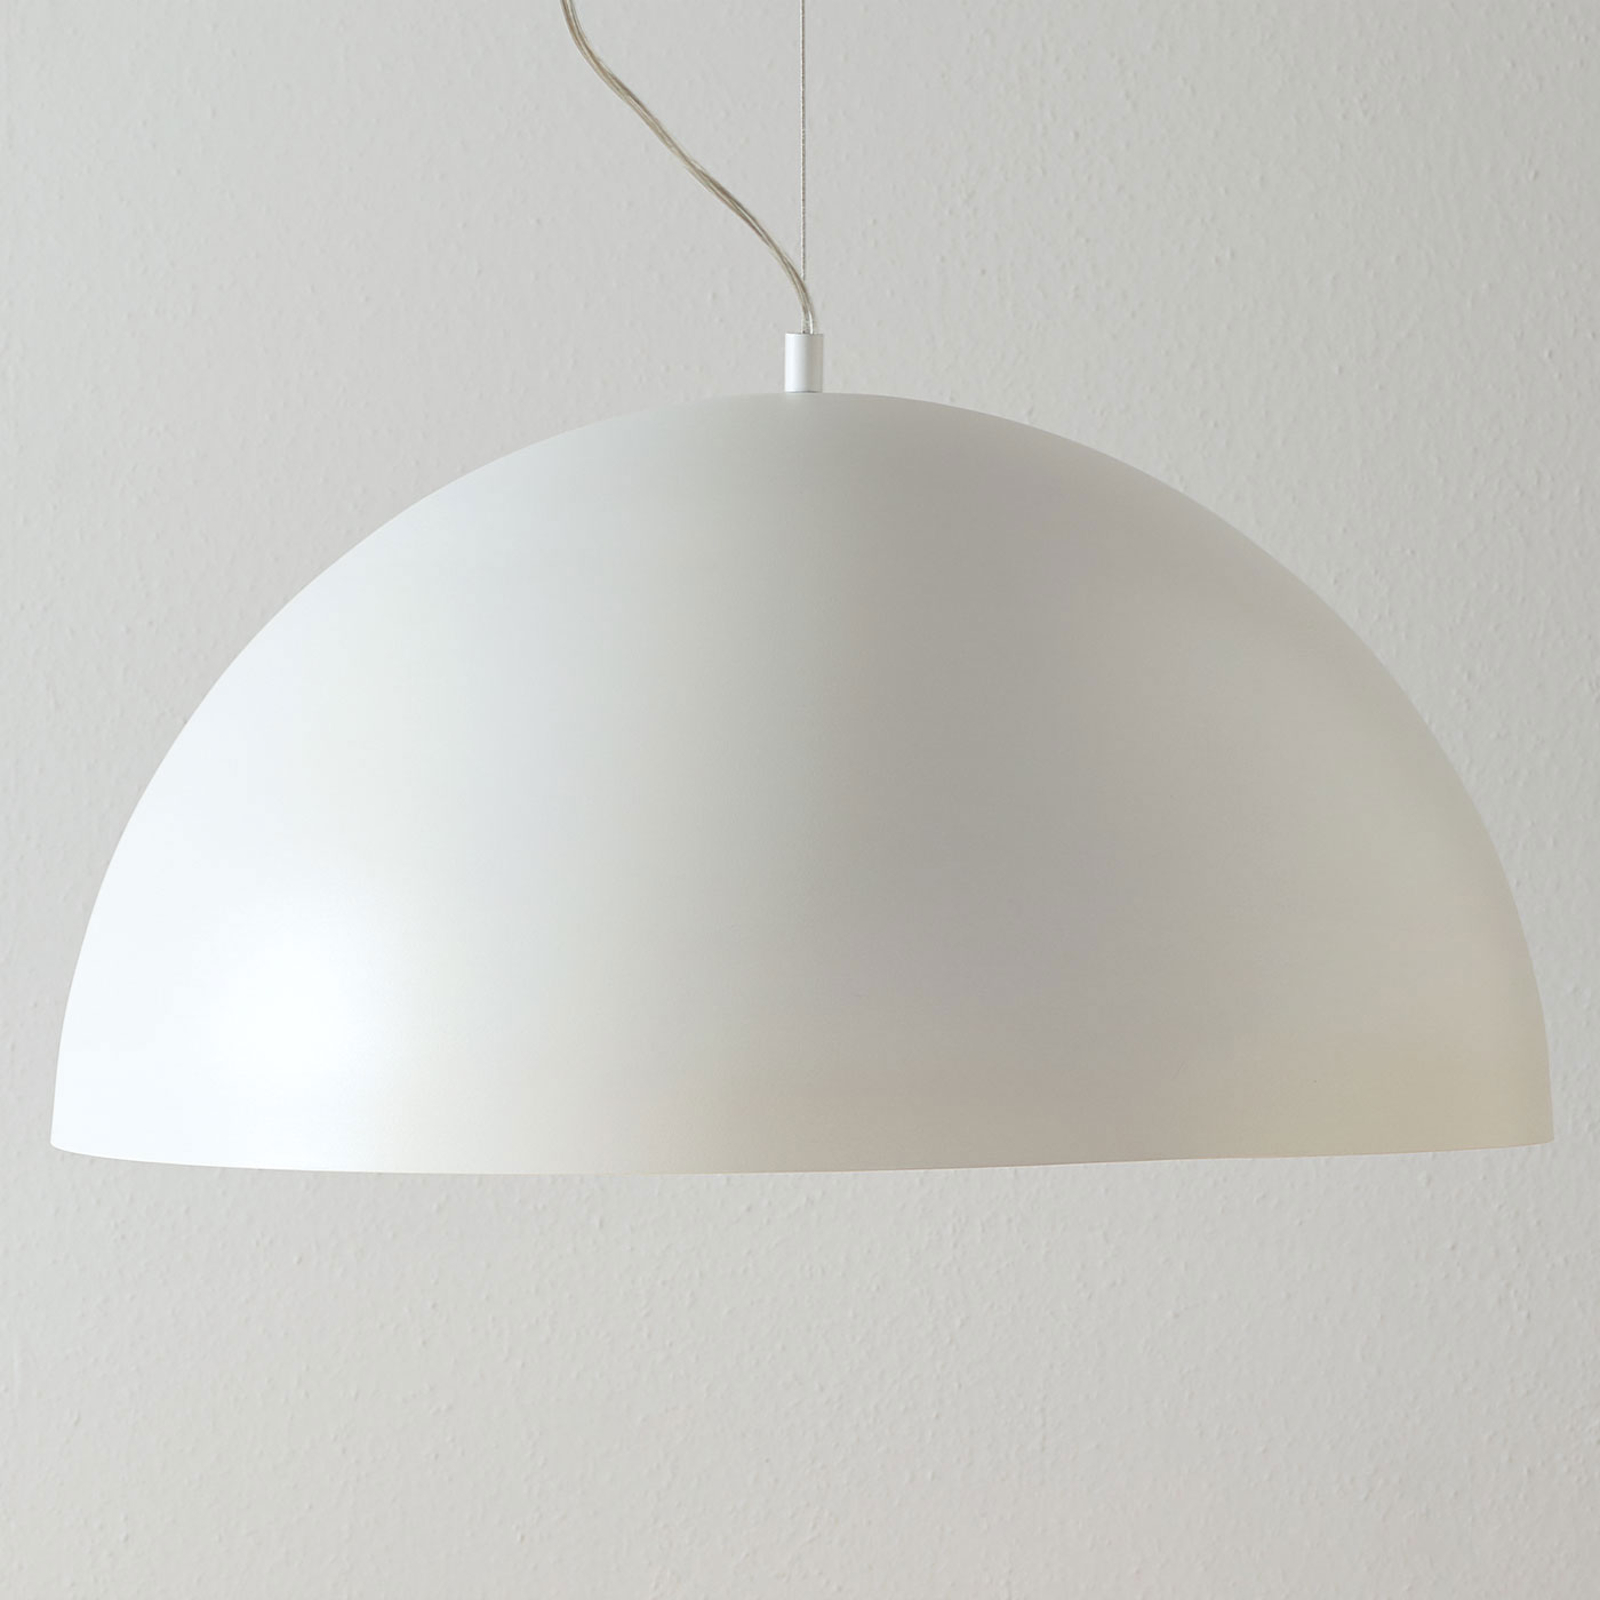 Lucande Maleo lampa wisząca 65cm biała